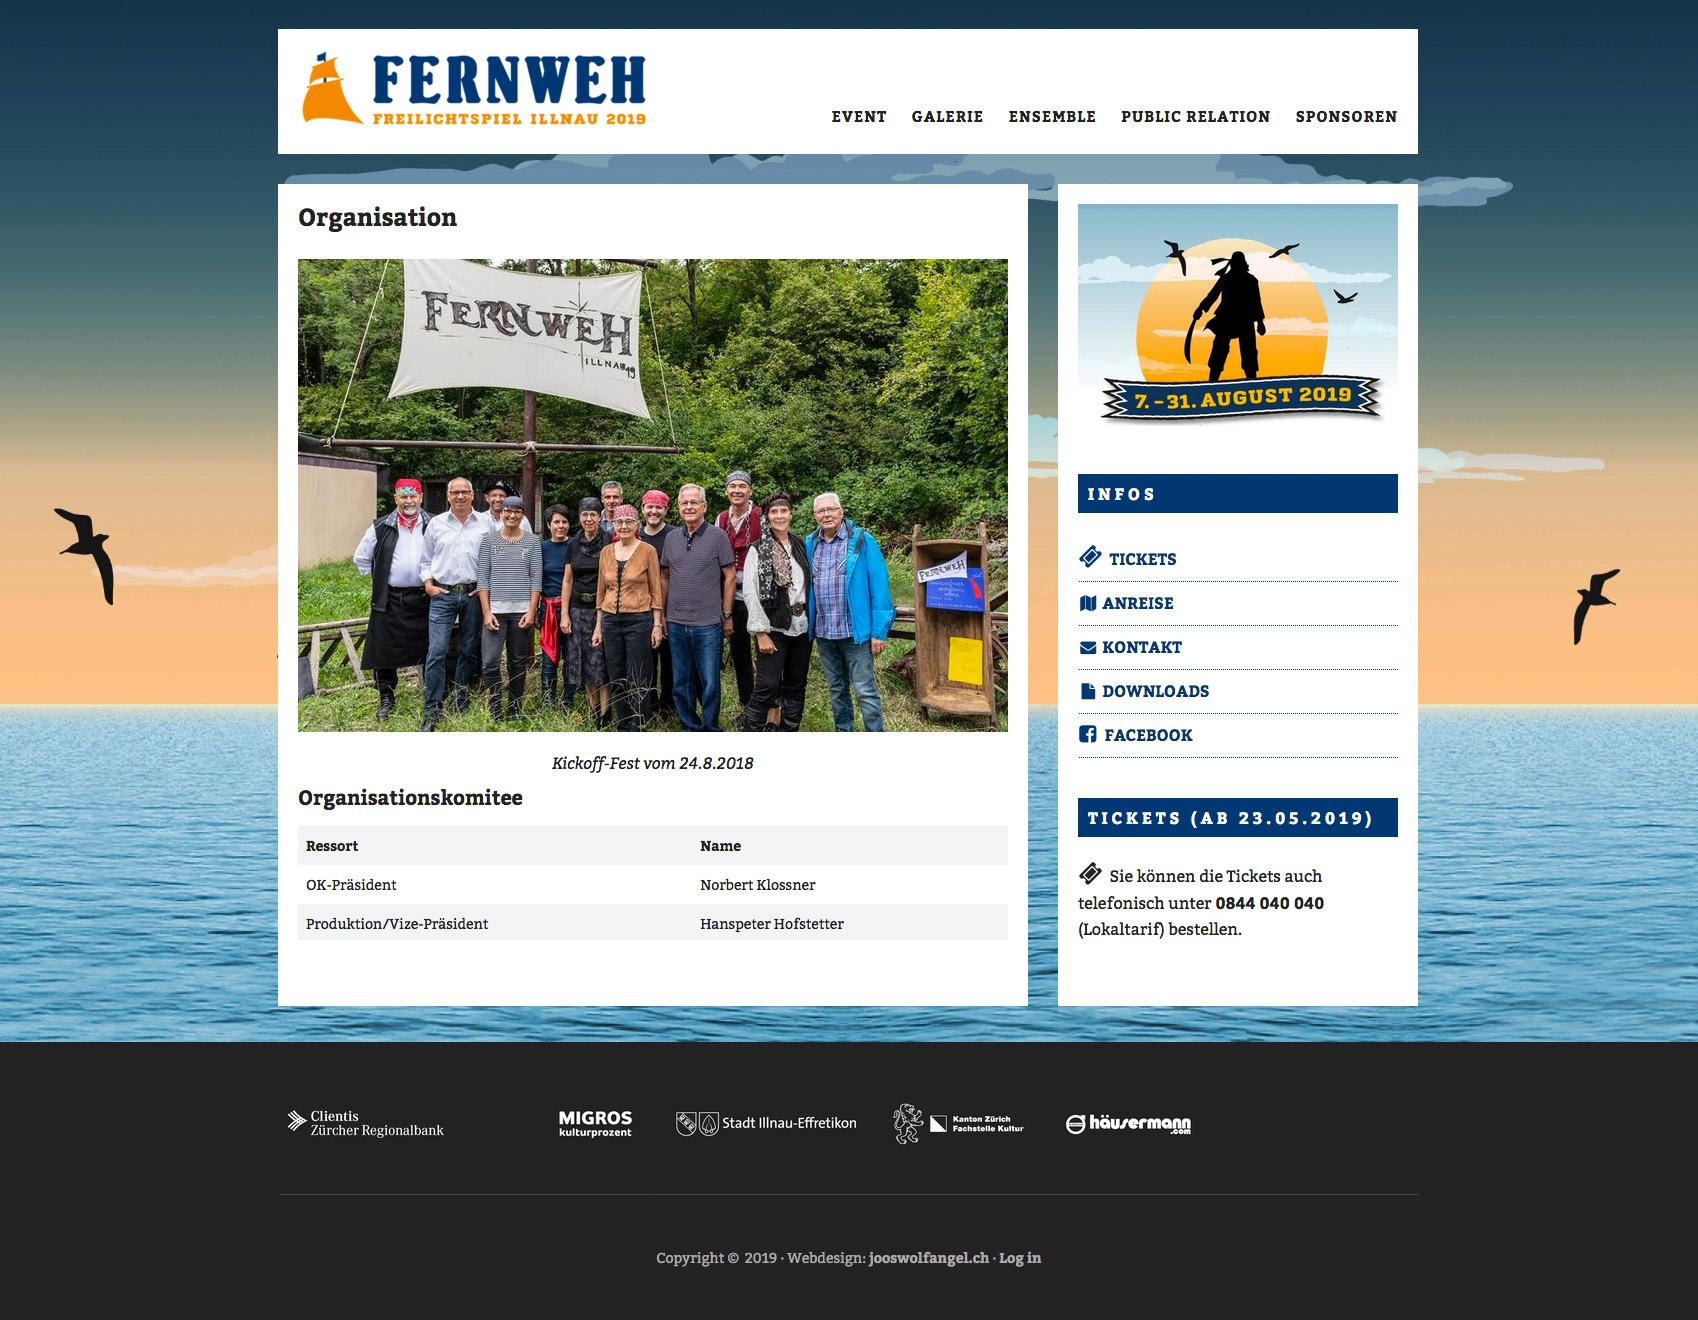 fernweh-organisation.jpg